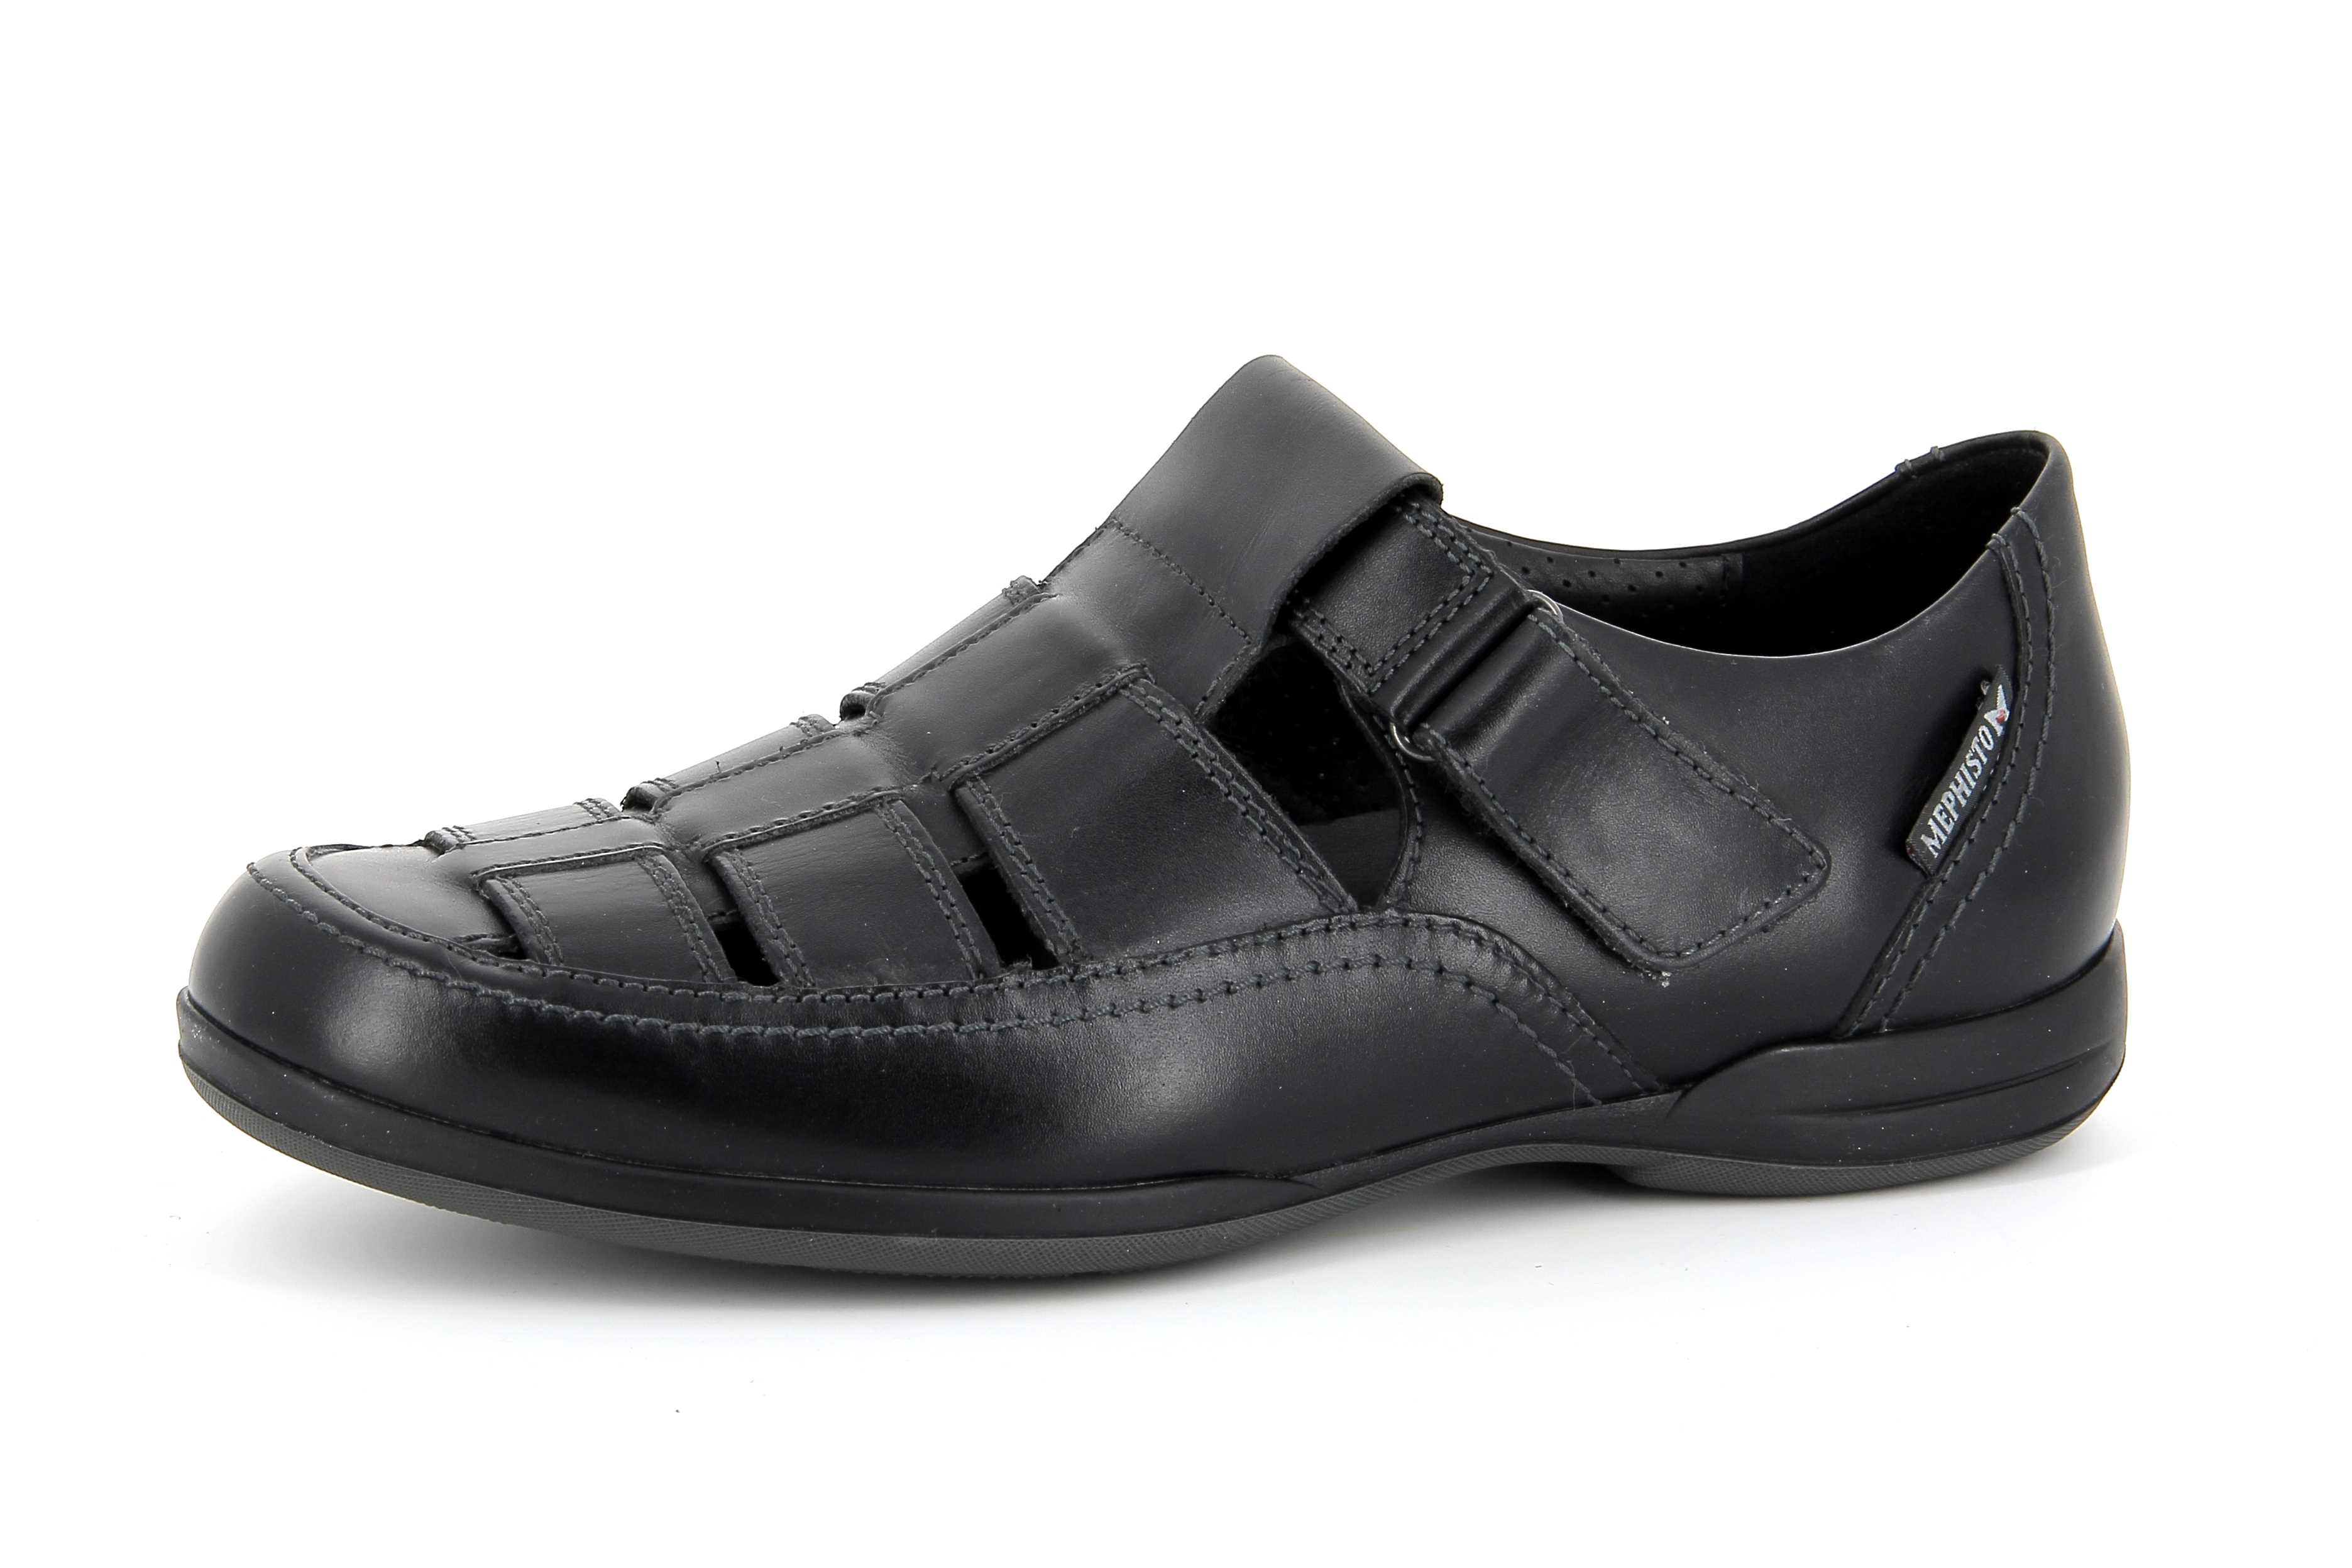 mephisto shop chaussures confortables velcro homme mod le rafael. Black Bedroom Furniture Sets. Home Design Ideas